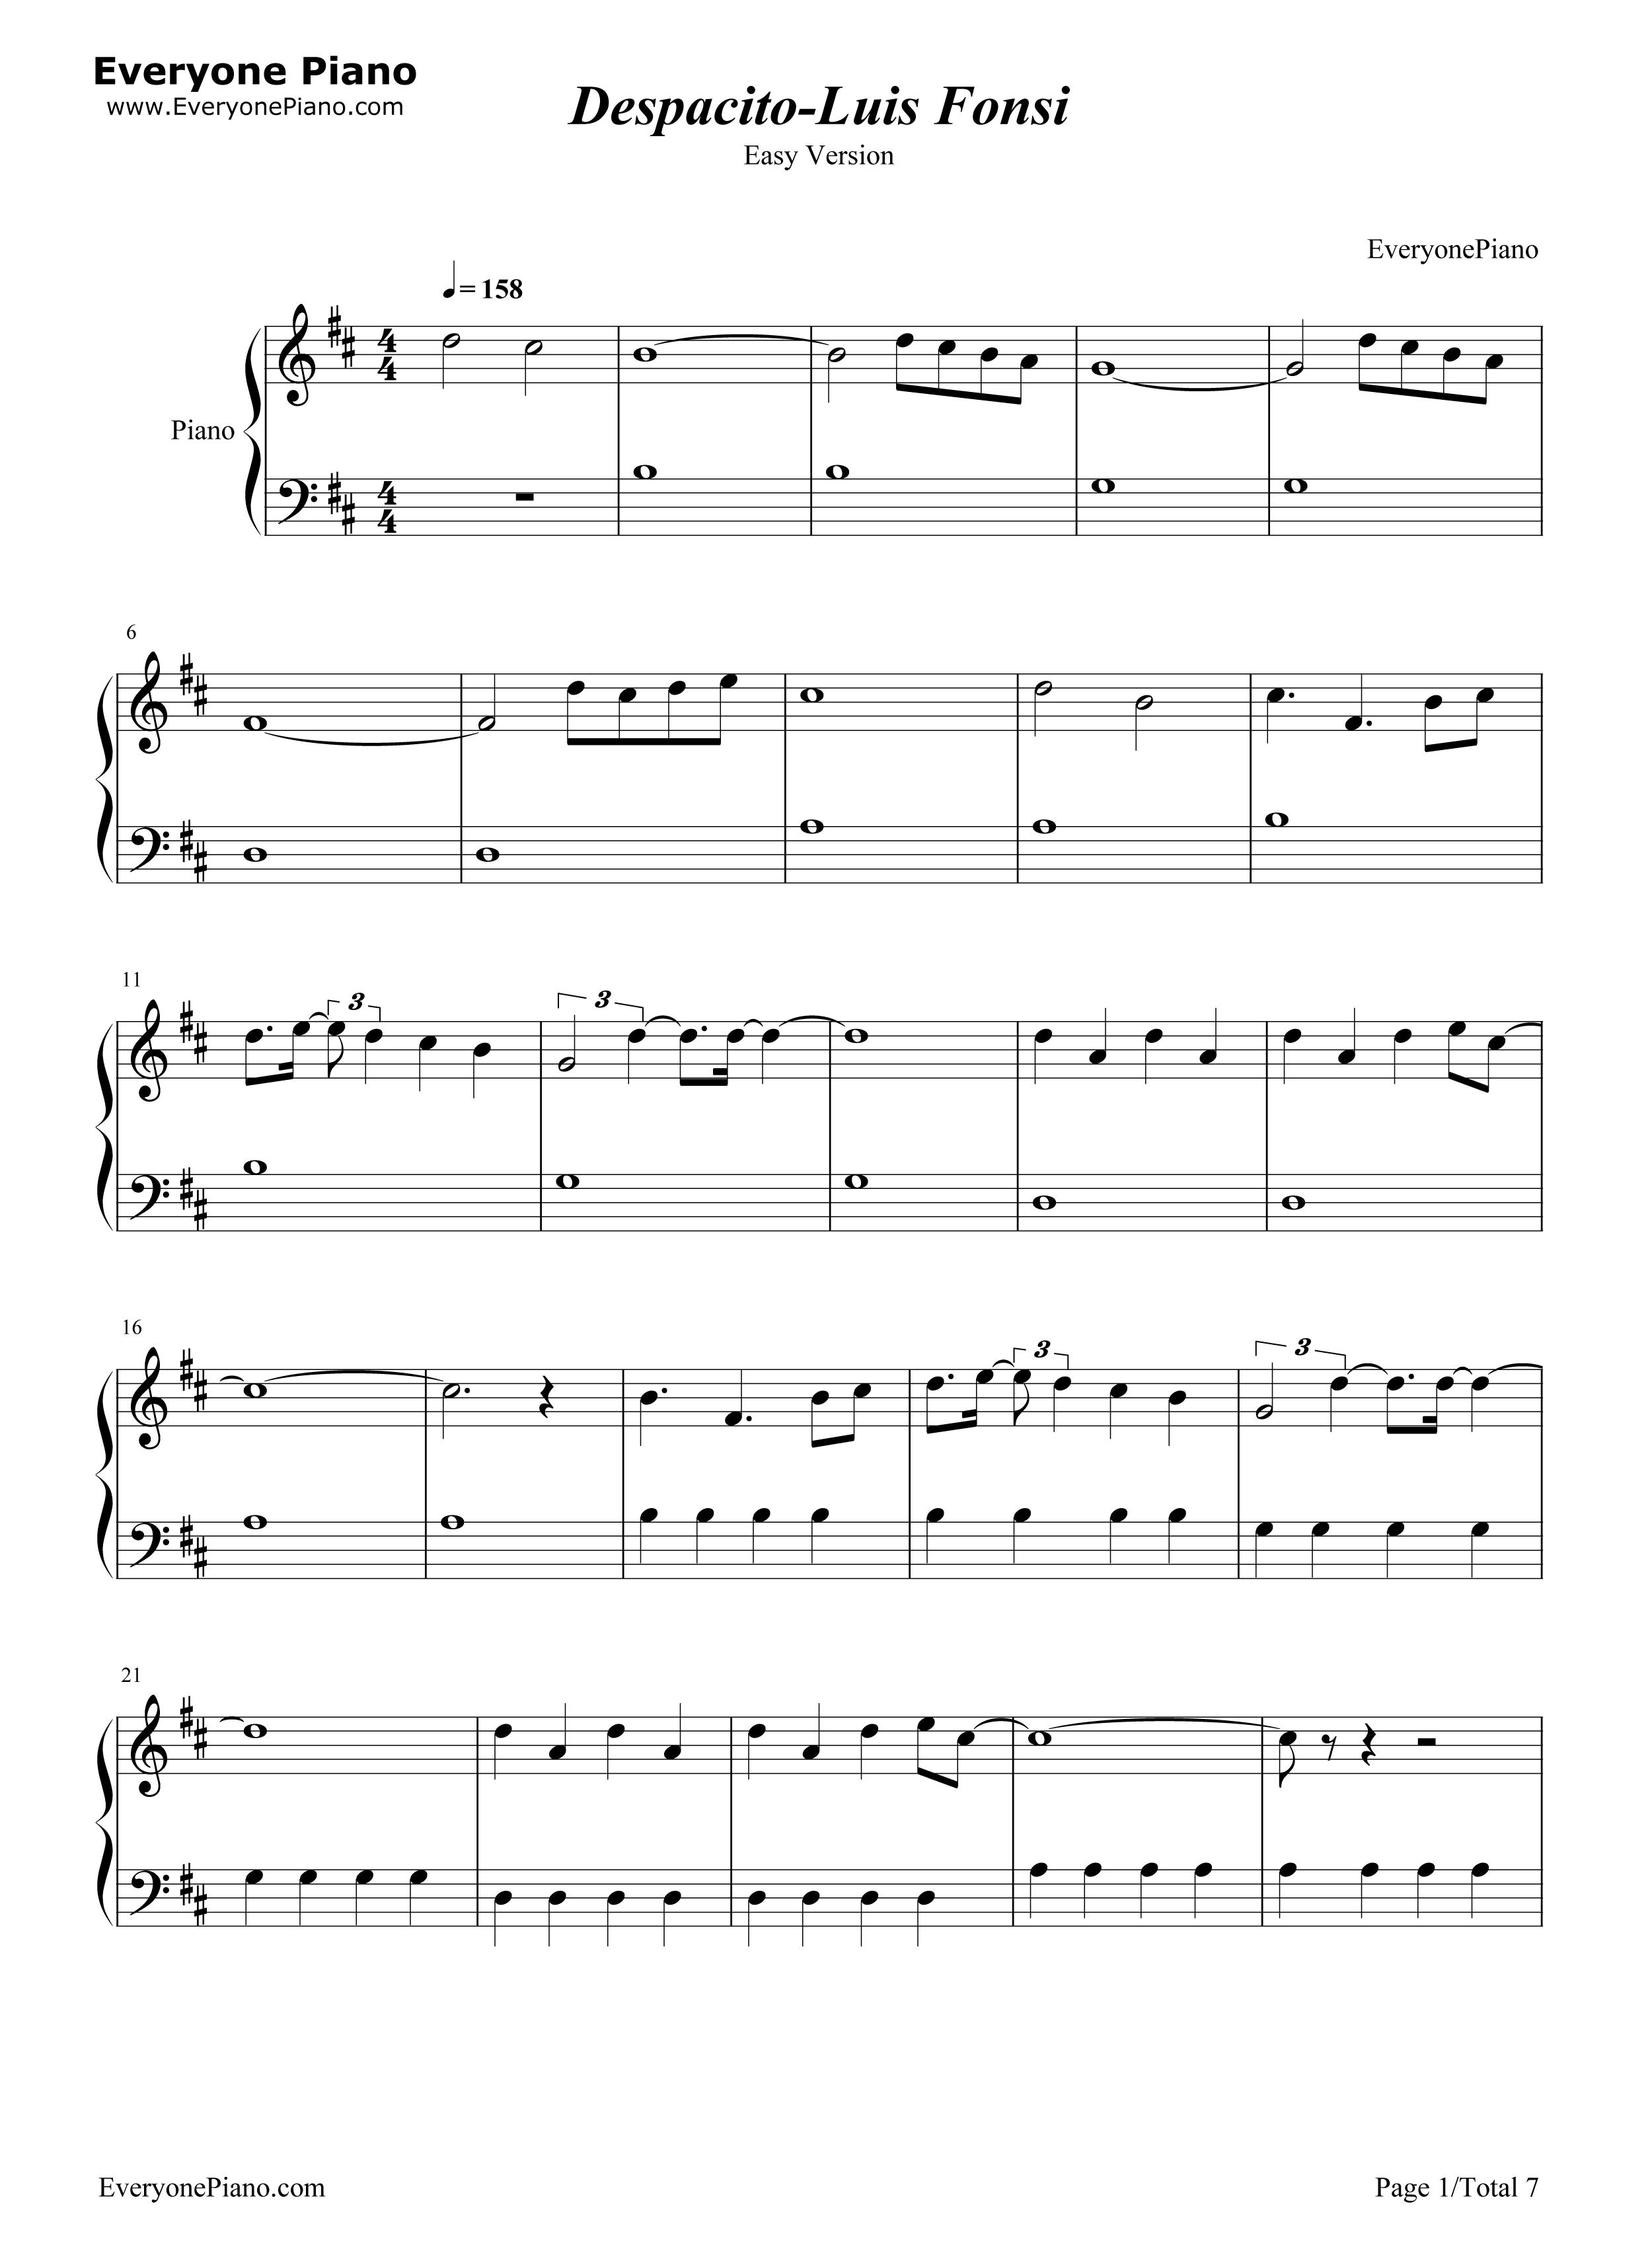 despacito简单版-luis fonsi五线谱预览1-钢琴谱(,)